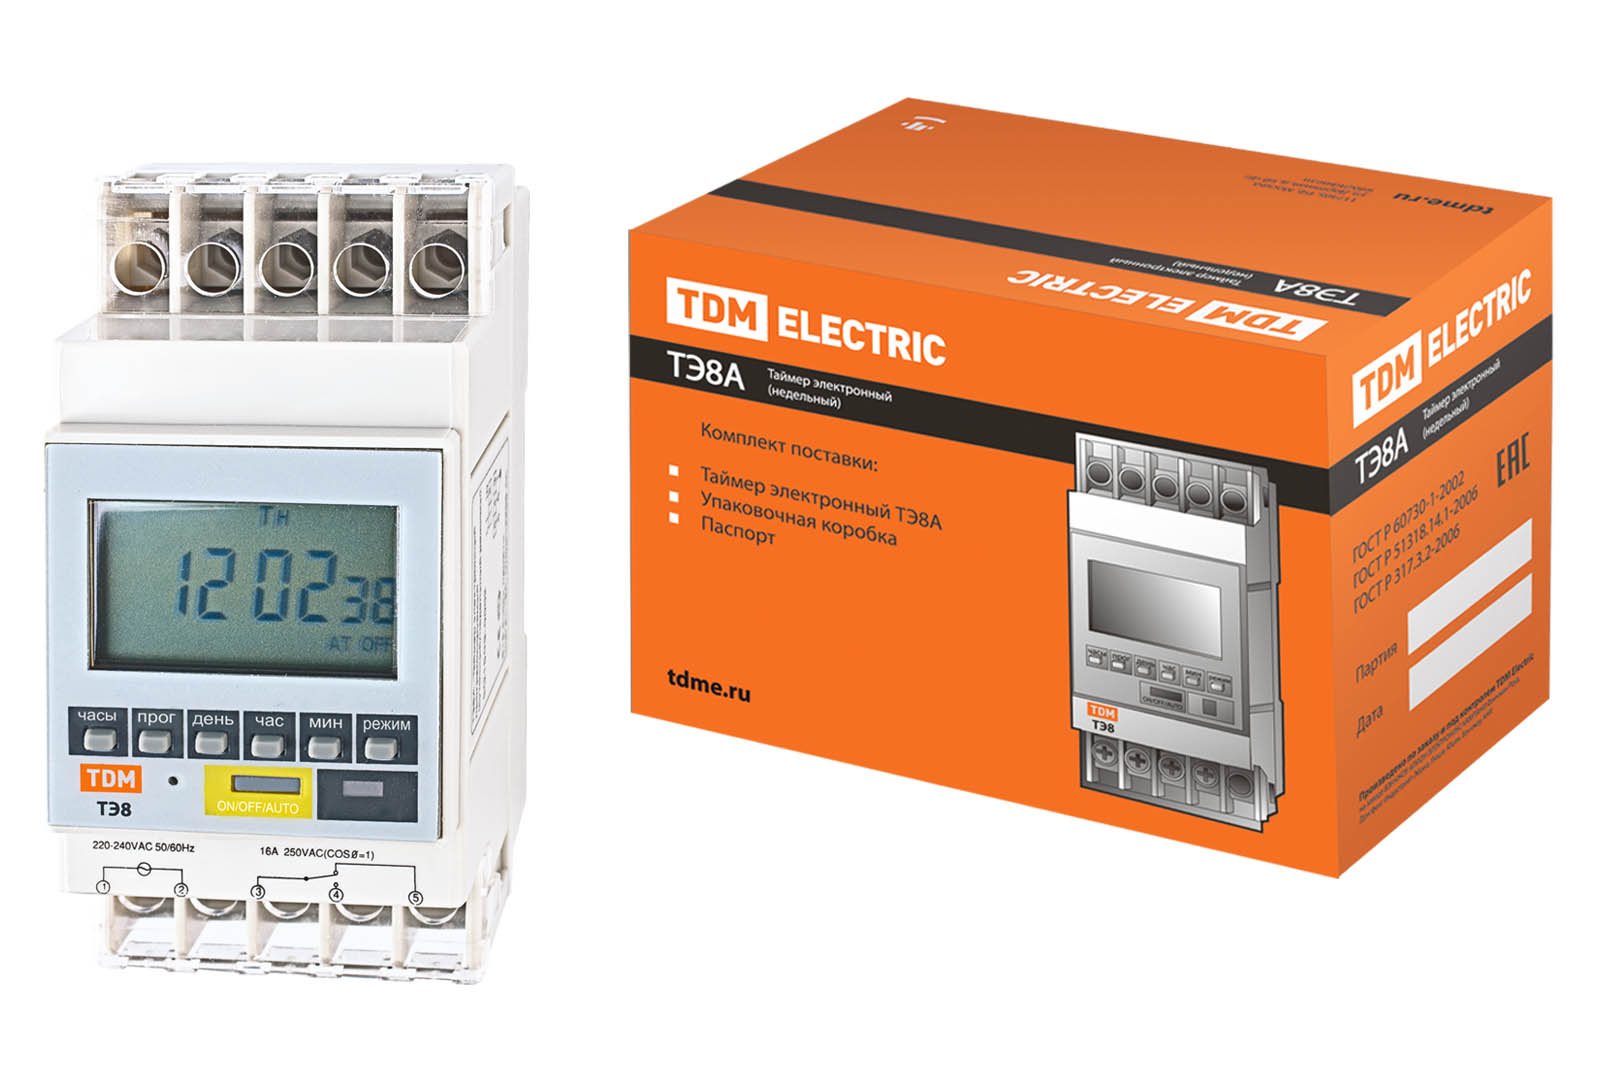 Таймер электронный на din-рейку ТЭ8A-1мин/7дн-8on/off-16А-DIN TDM SQ1503-0002 TDM Electric